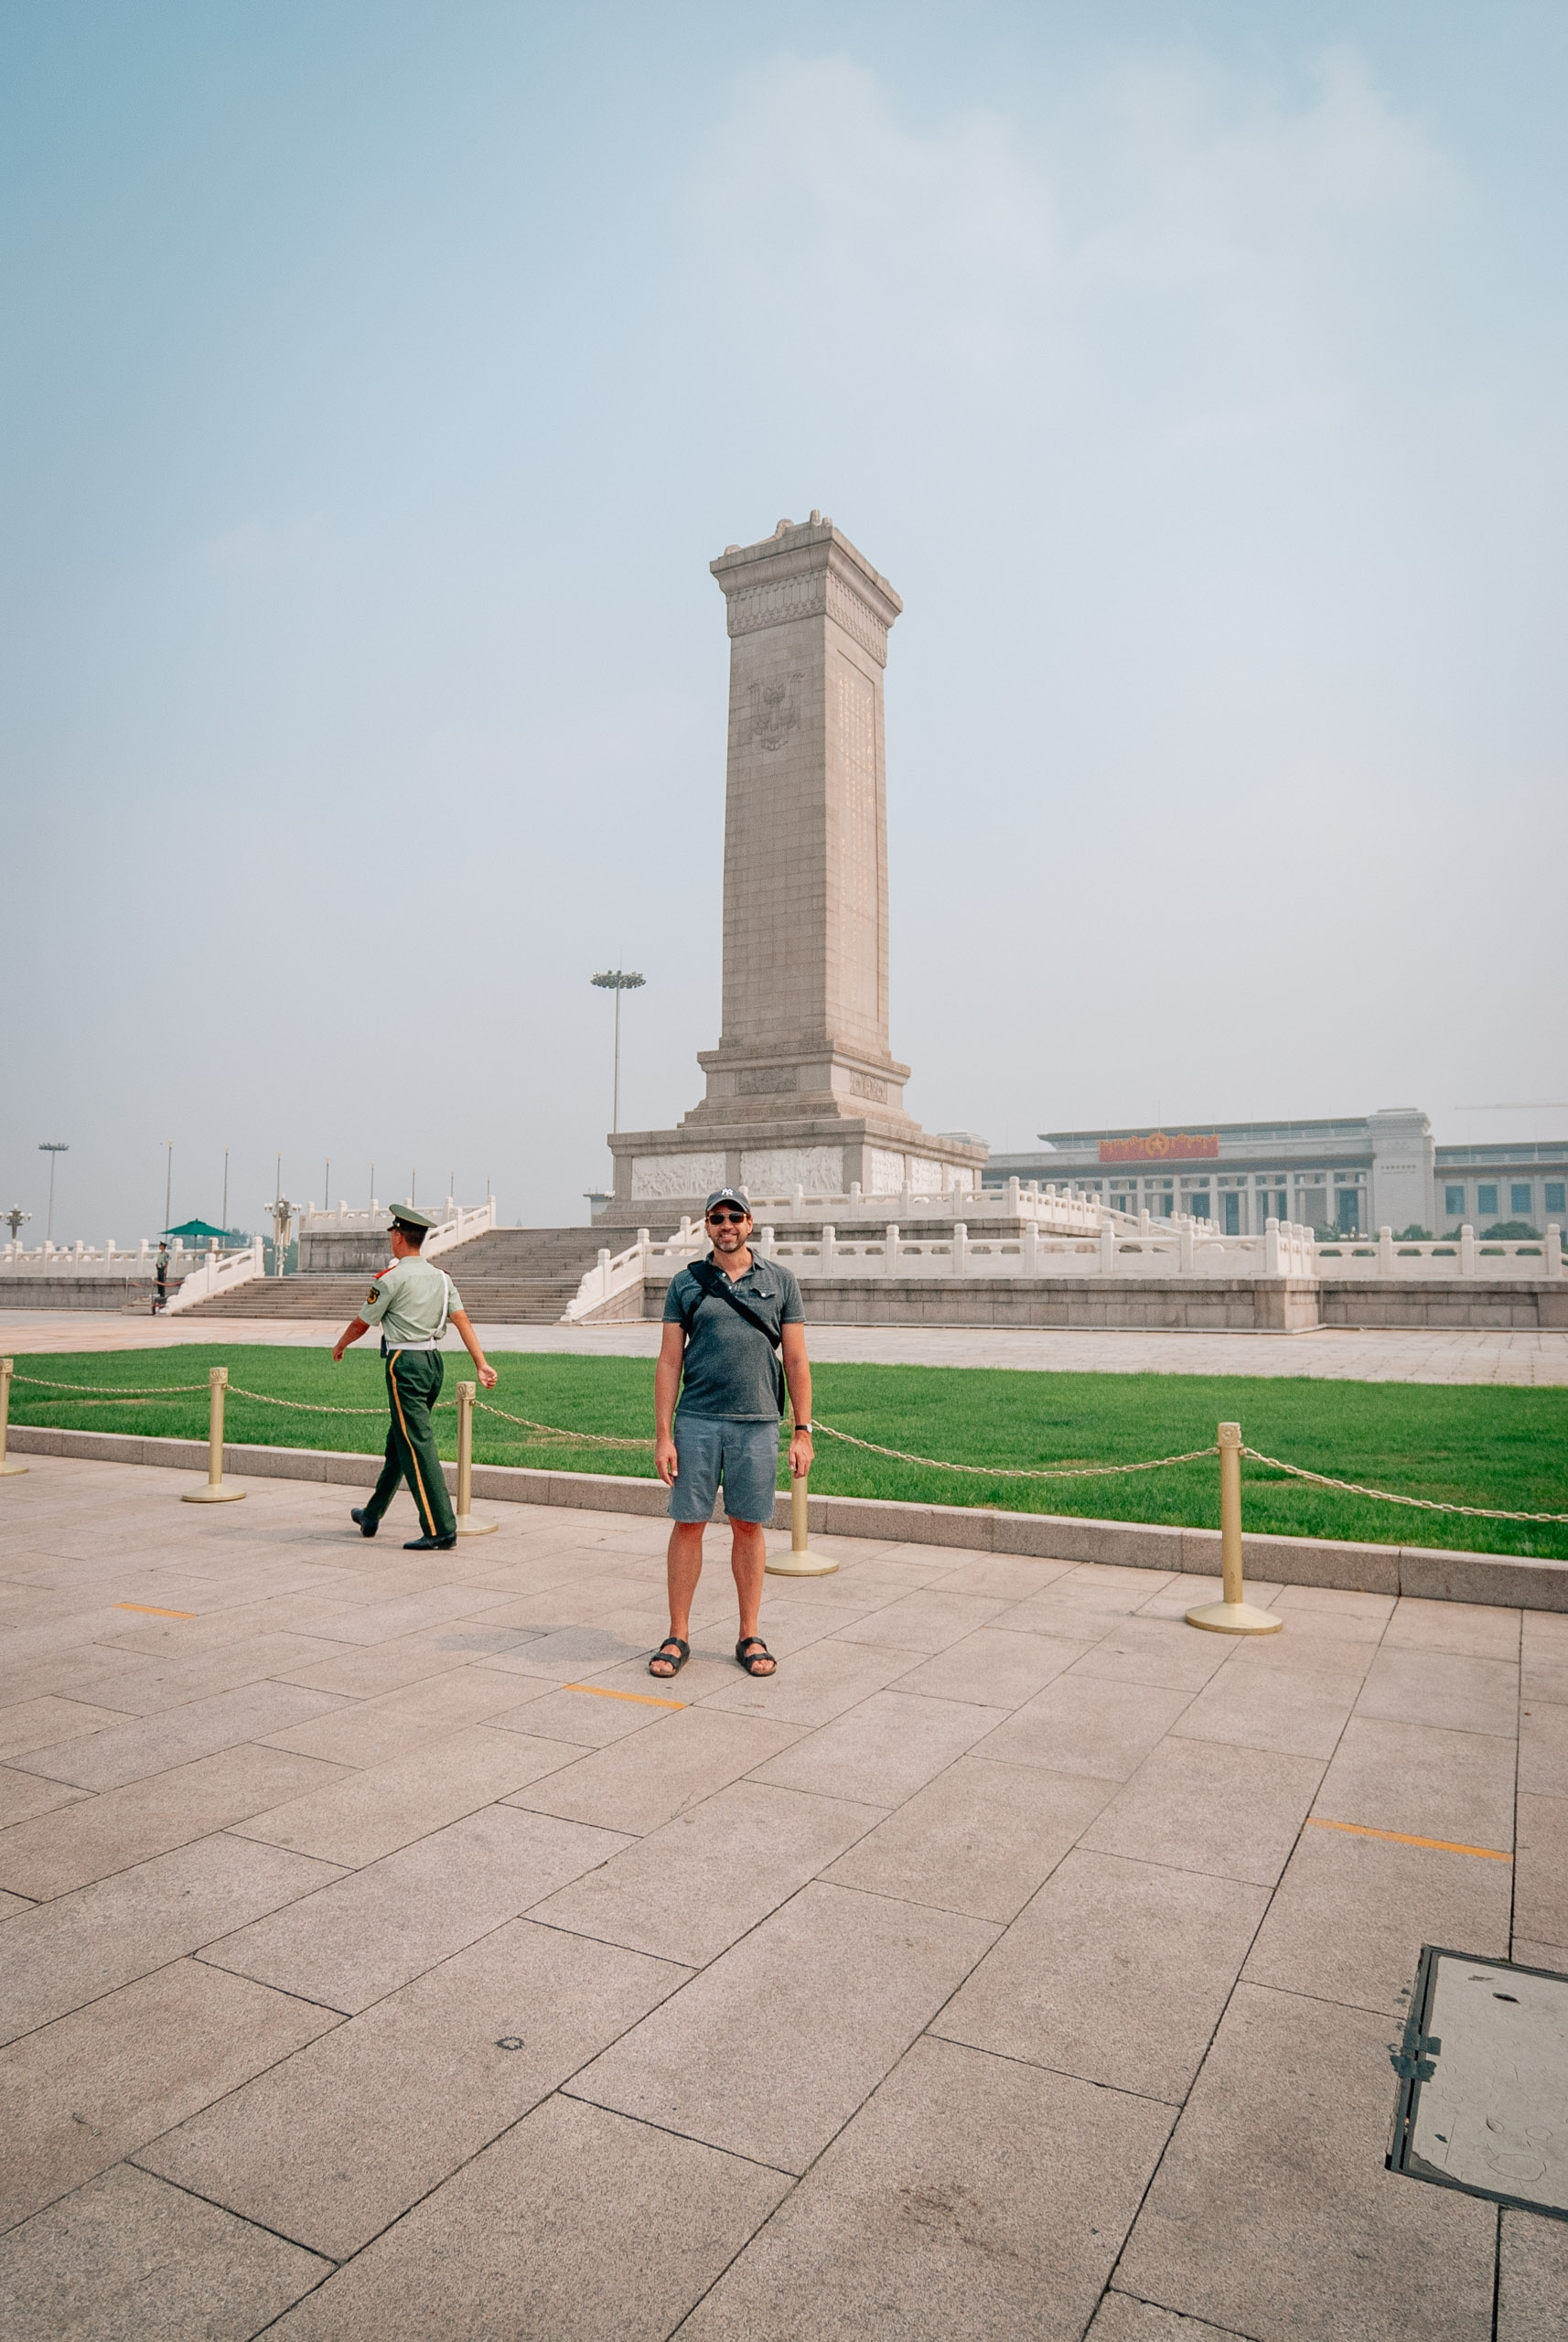 China - Beijing & The Great Wall - 2010-0903-DSC_0284_2320